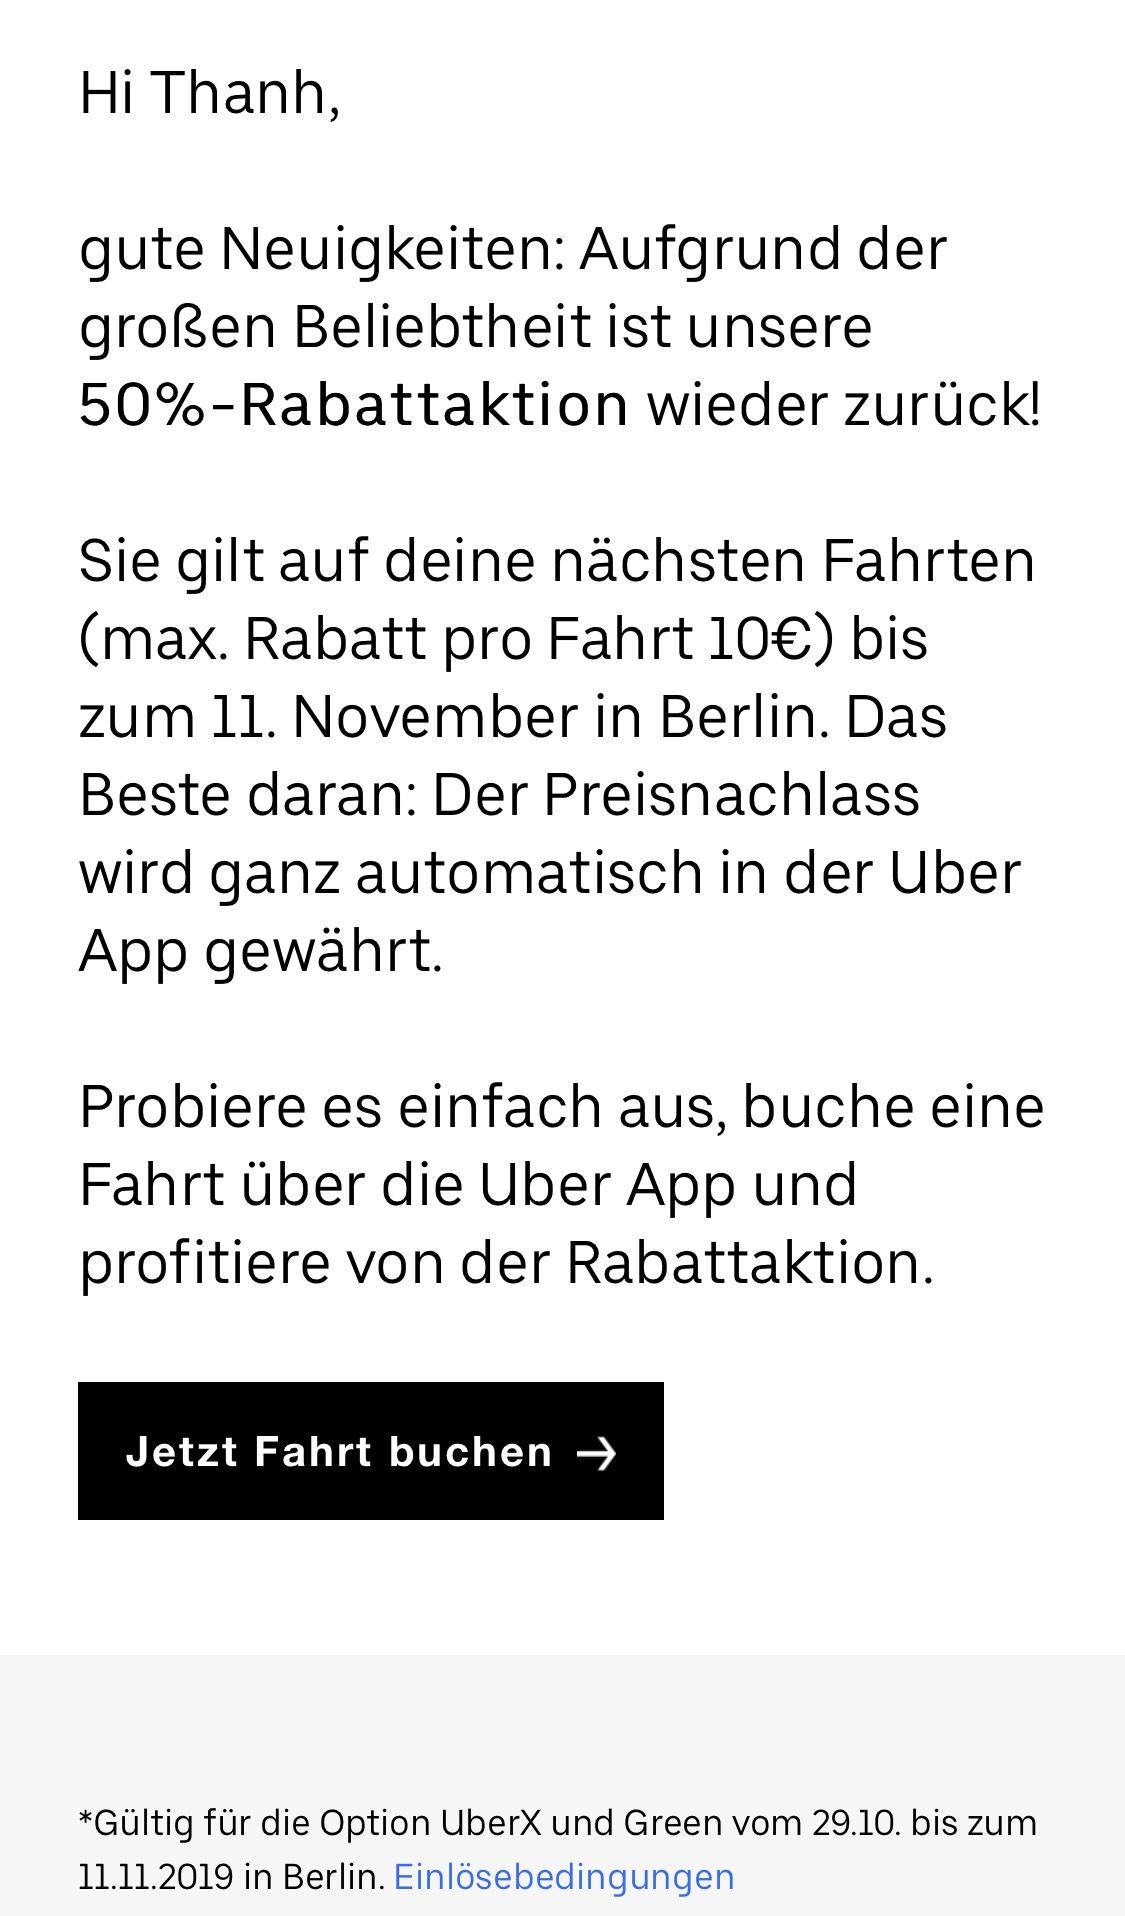 Local Berlin - UberX 50% Aktion ist zurück